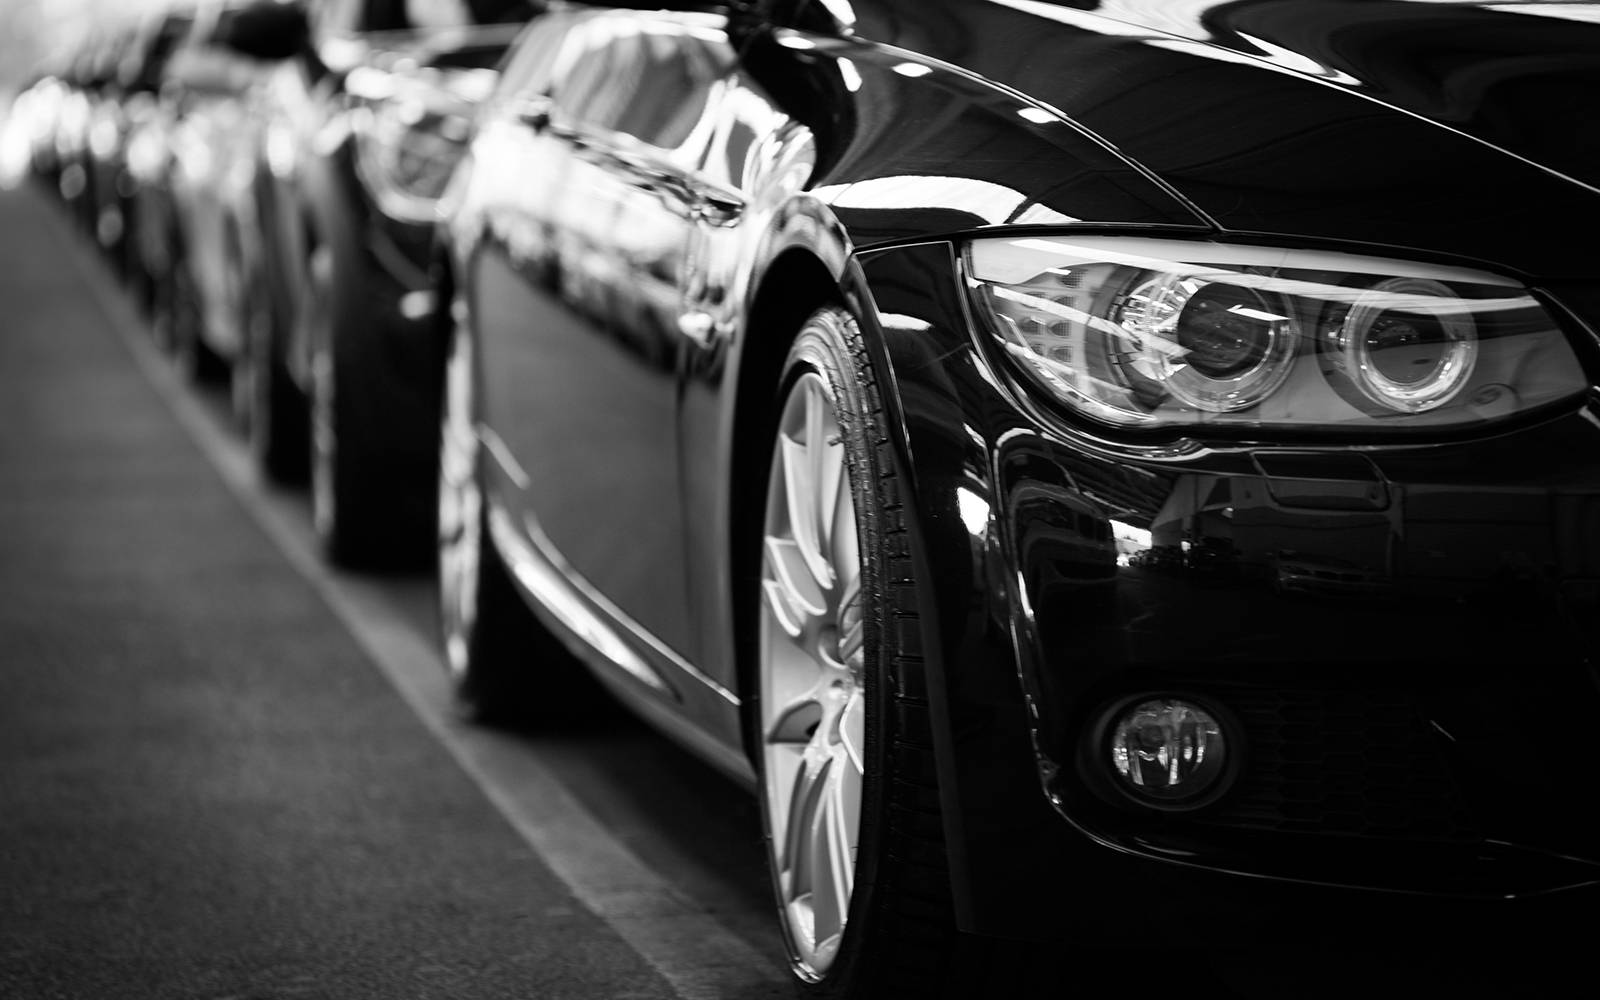 outils reduire sinistres flottes automobiles - Blog SFAM